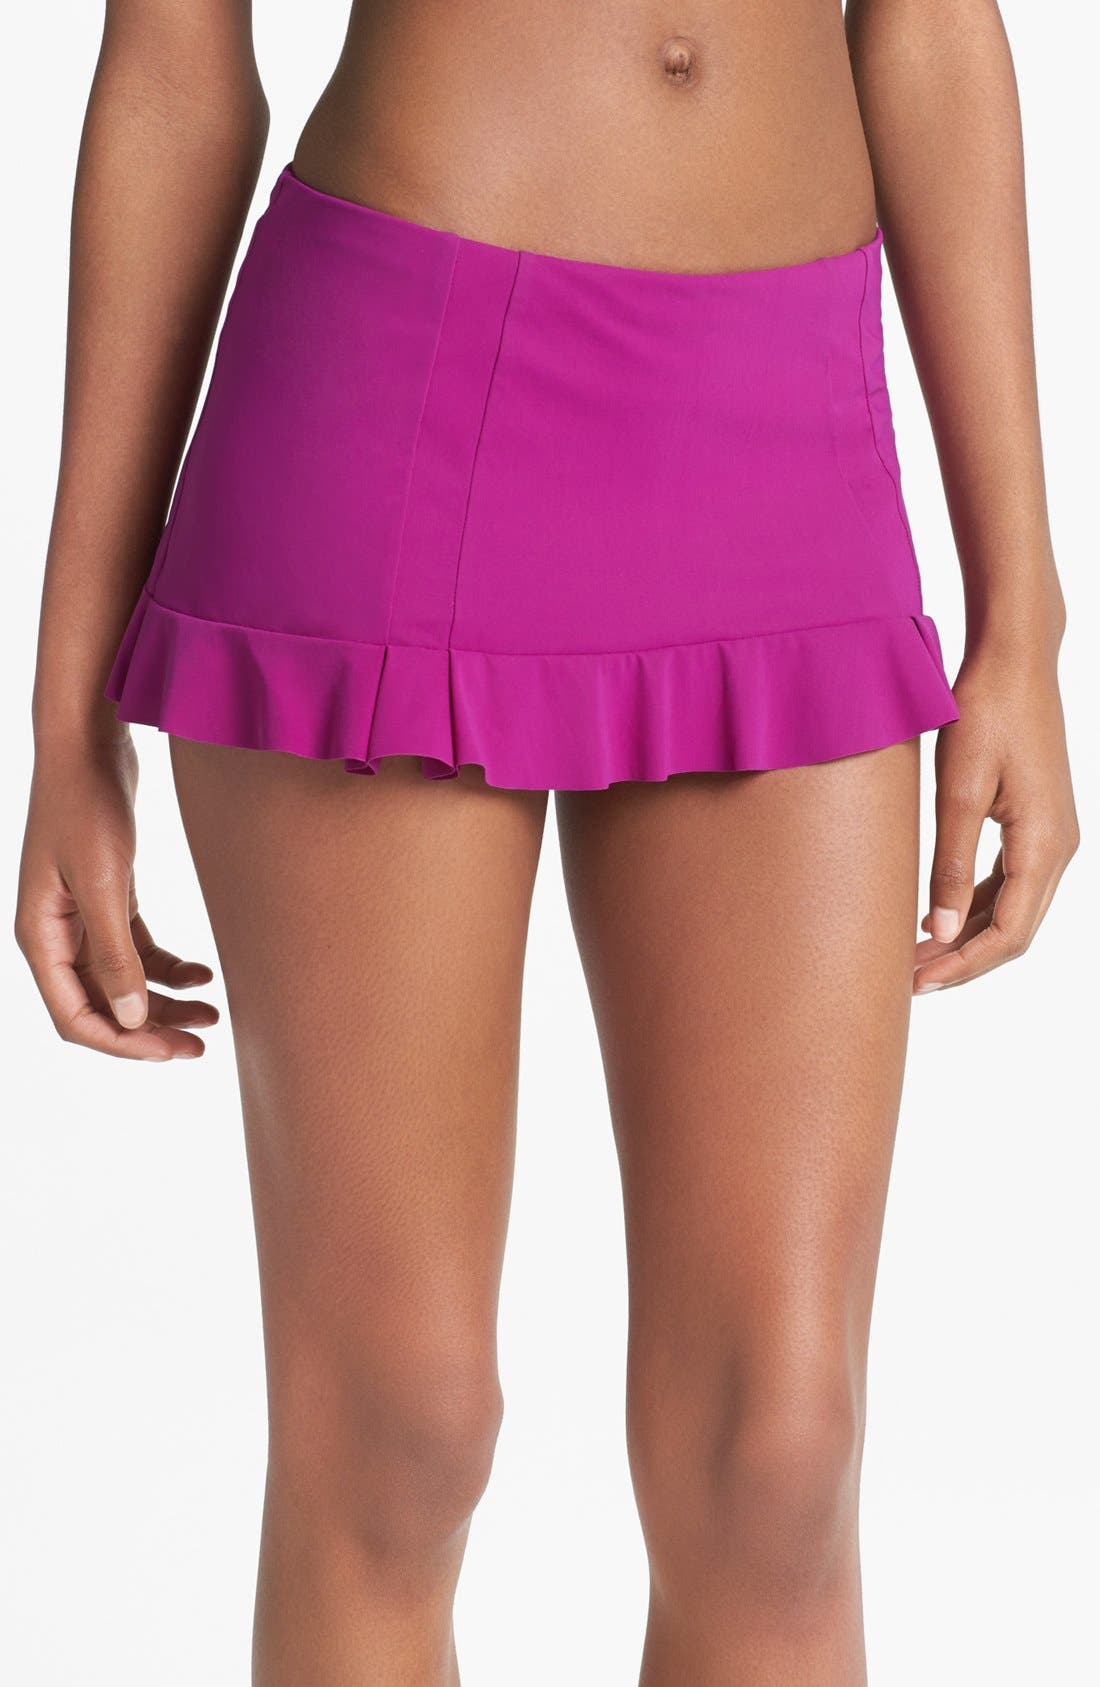 Main Image - Profile by Gottex 'Starlet' Skirted Bikini Bottoms